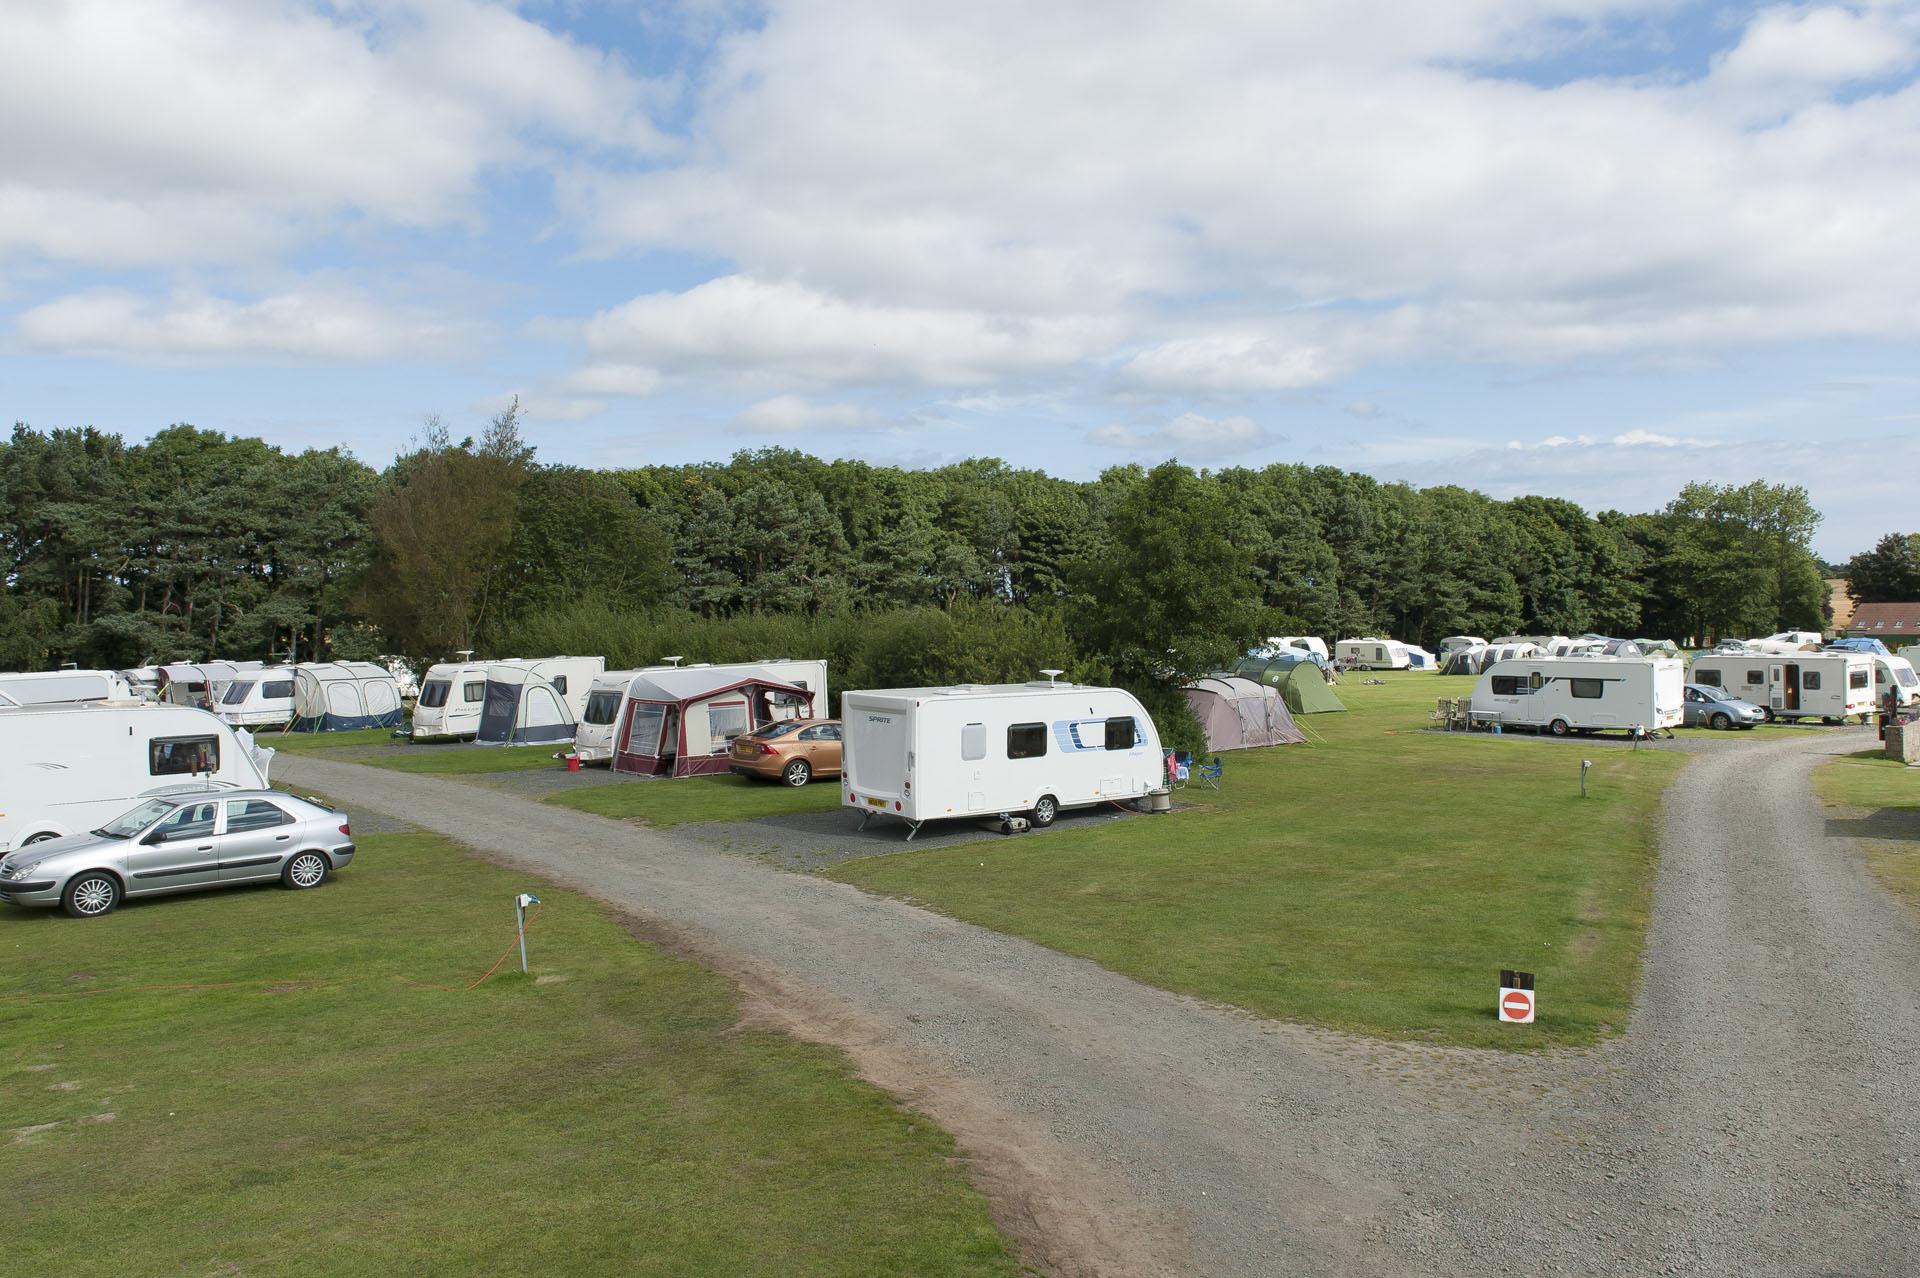 Dunstan Hill Campsite - Camping and Caravanning Club Site